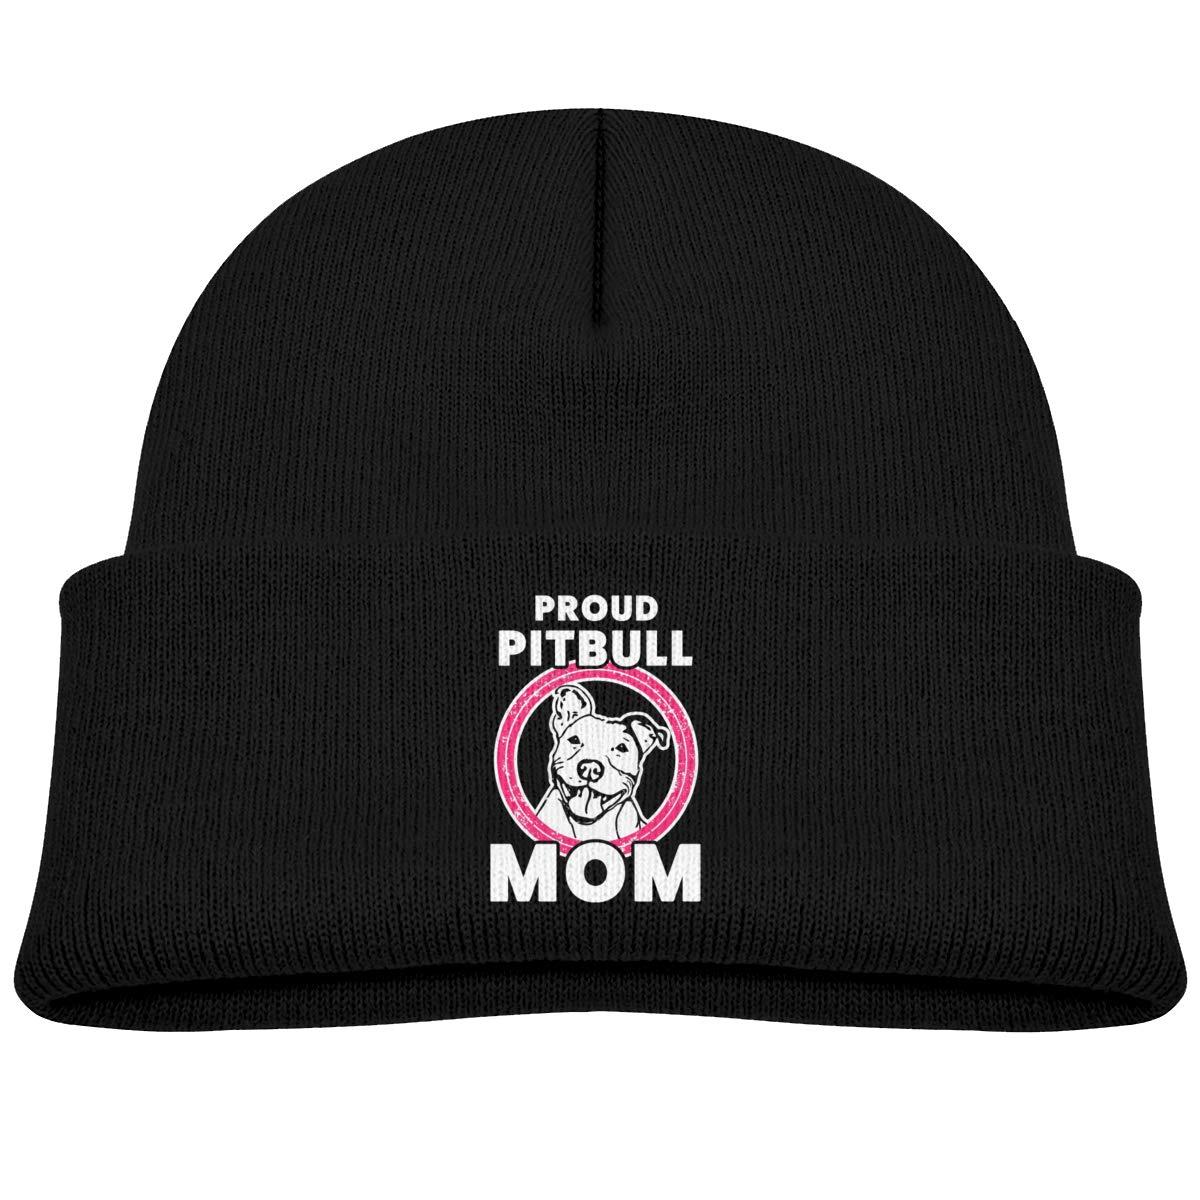 Hanfjj Kefdk Proud Pitbull Mom Infant Knit Hats Kids Beanie Caps